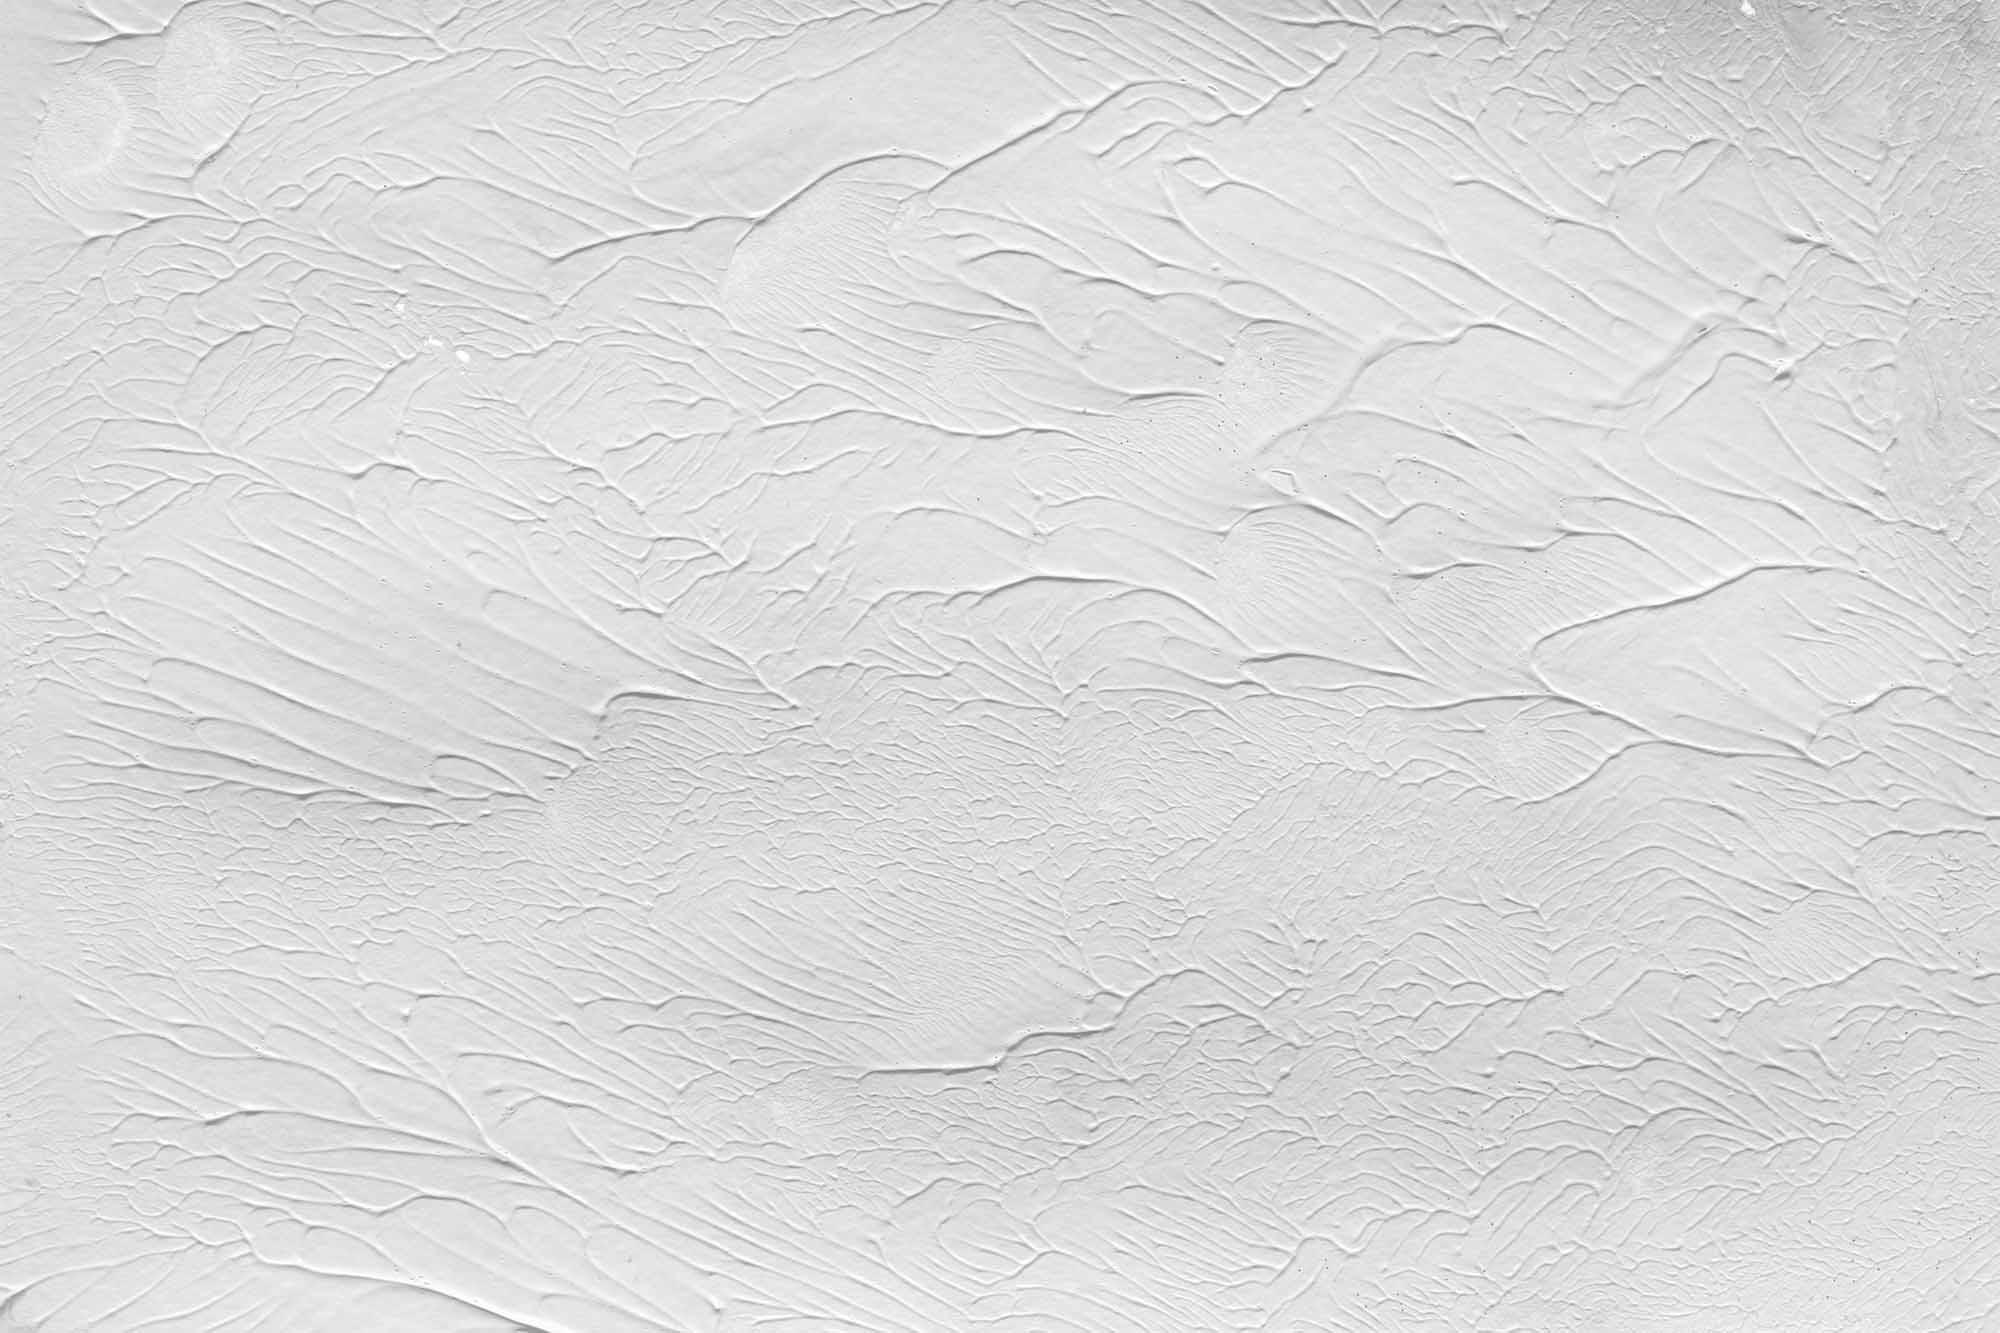 Handpainted Acrylic Textures 1